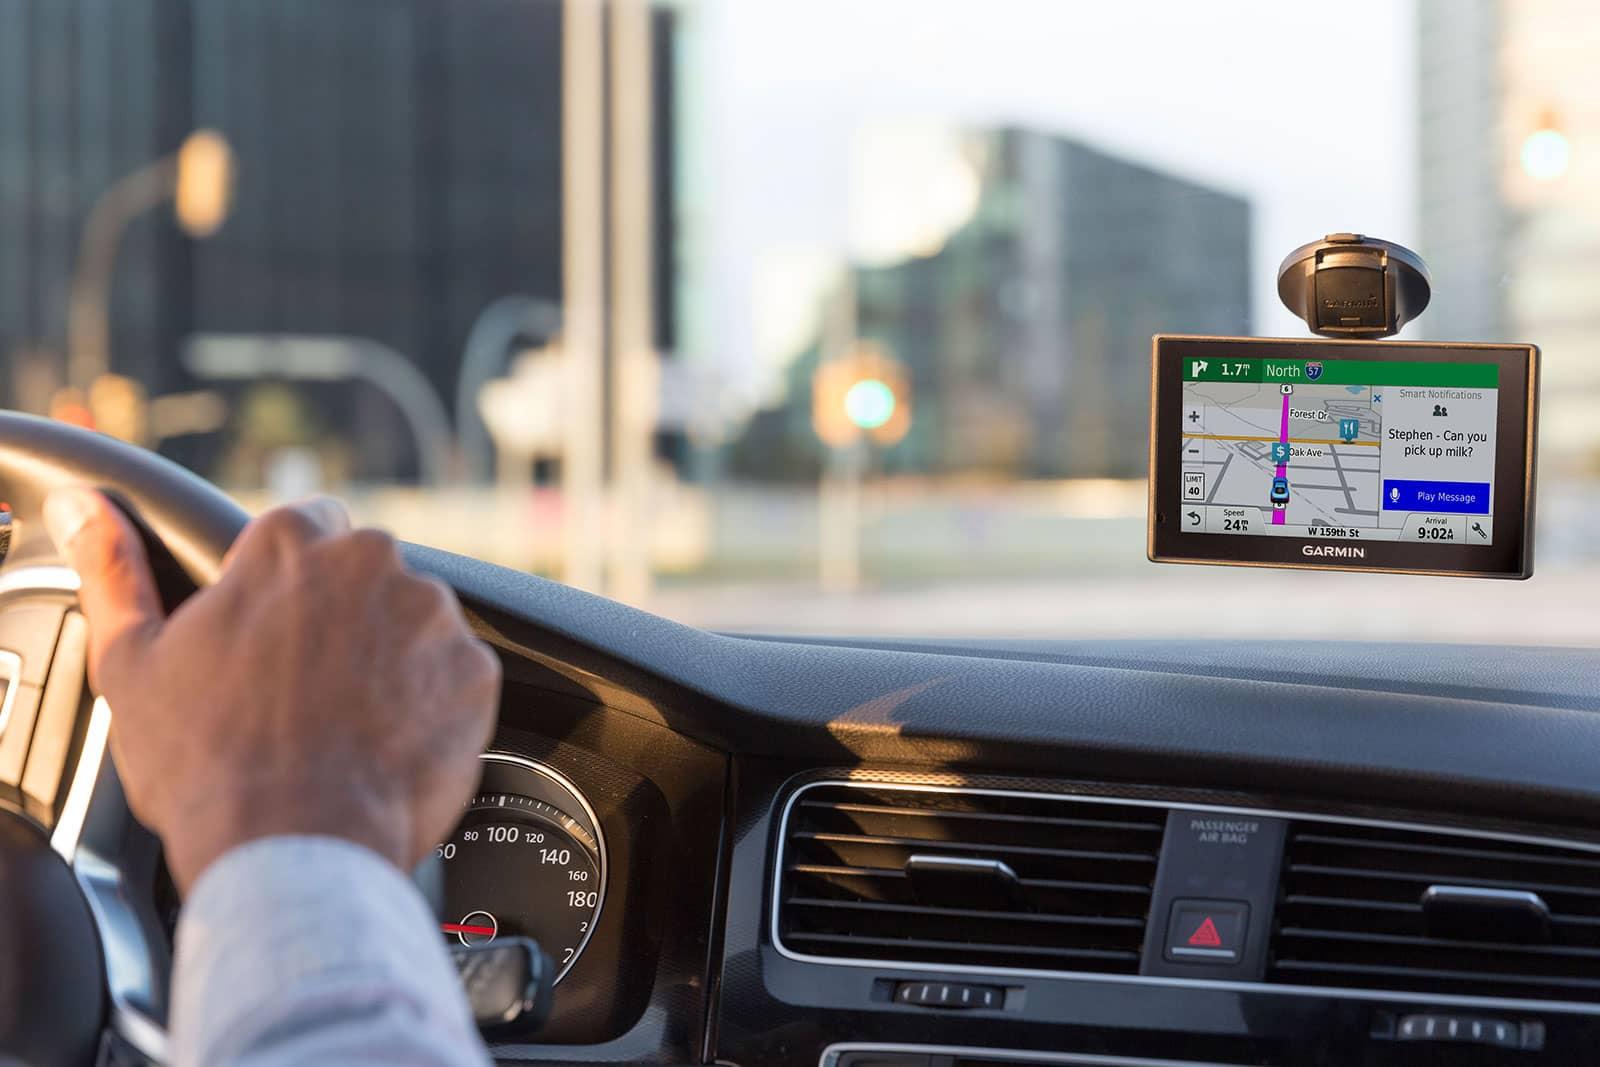 GPS in rental car